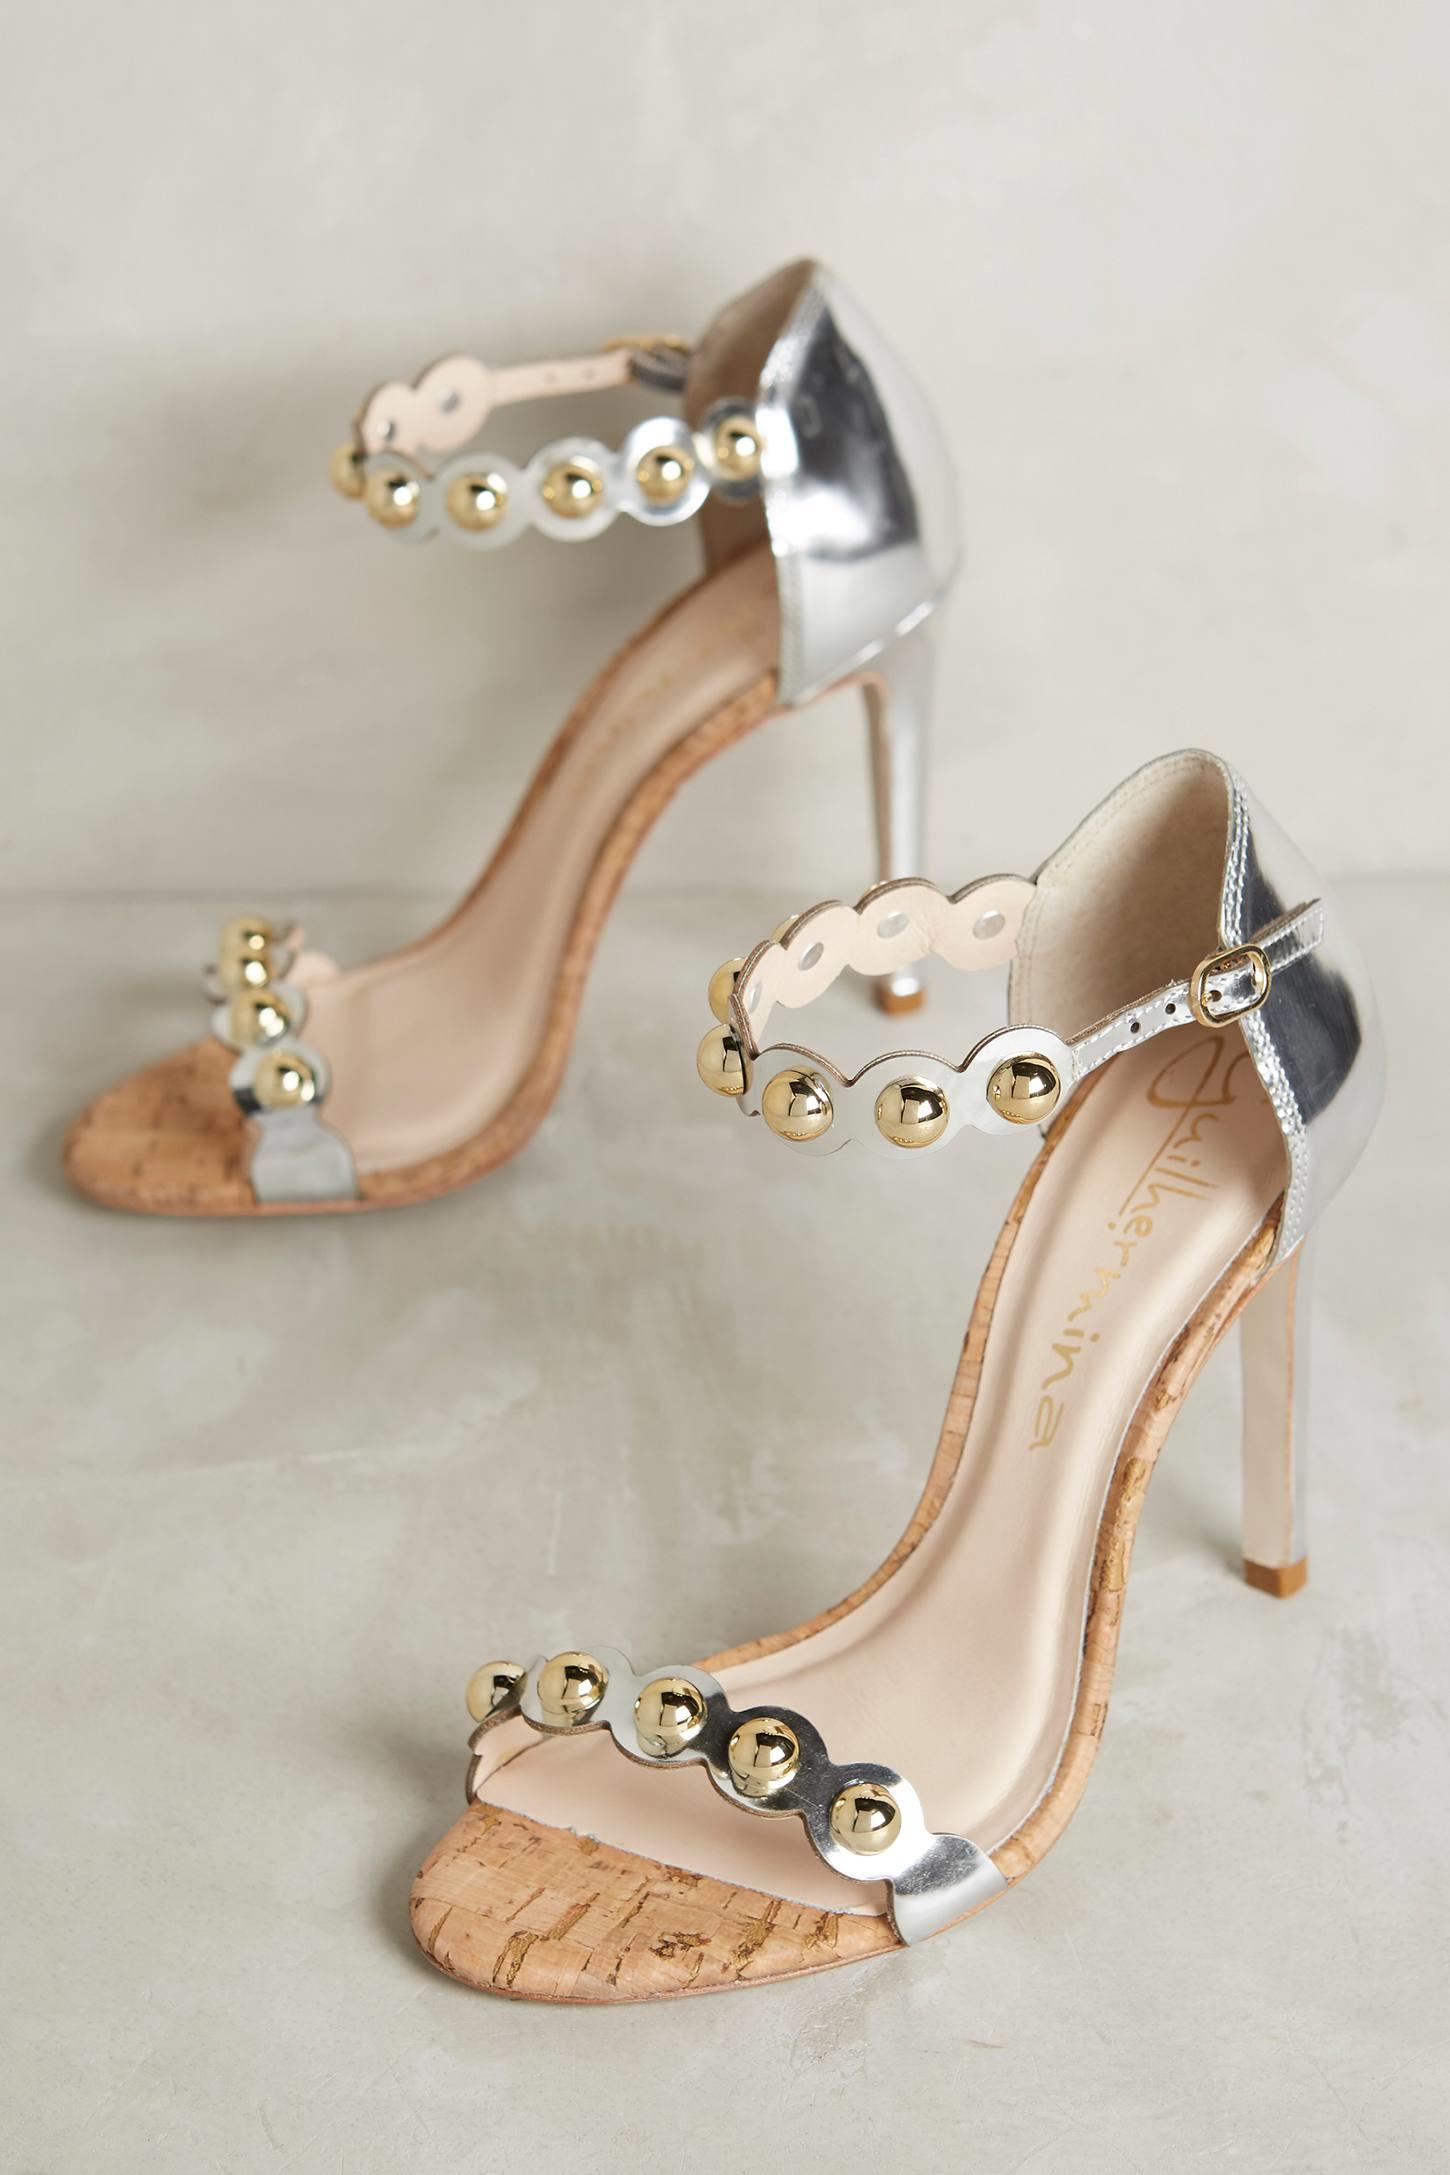 a2ce7cb8868 Lyst - Guilhermina Valentina Heels in Metallic